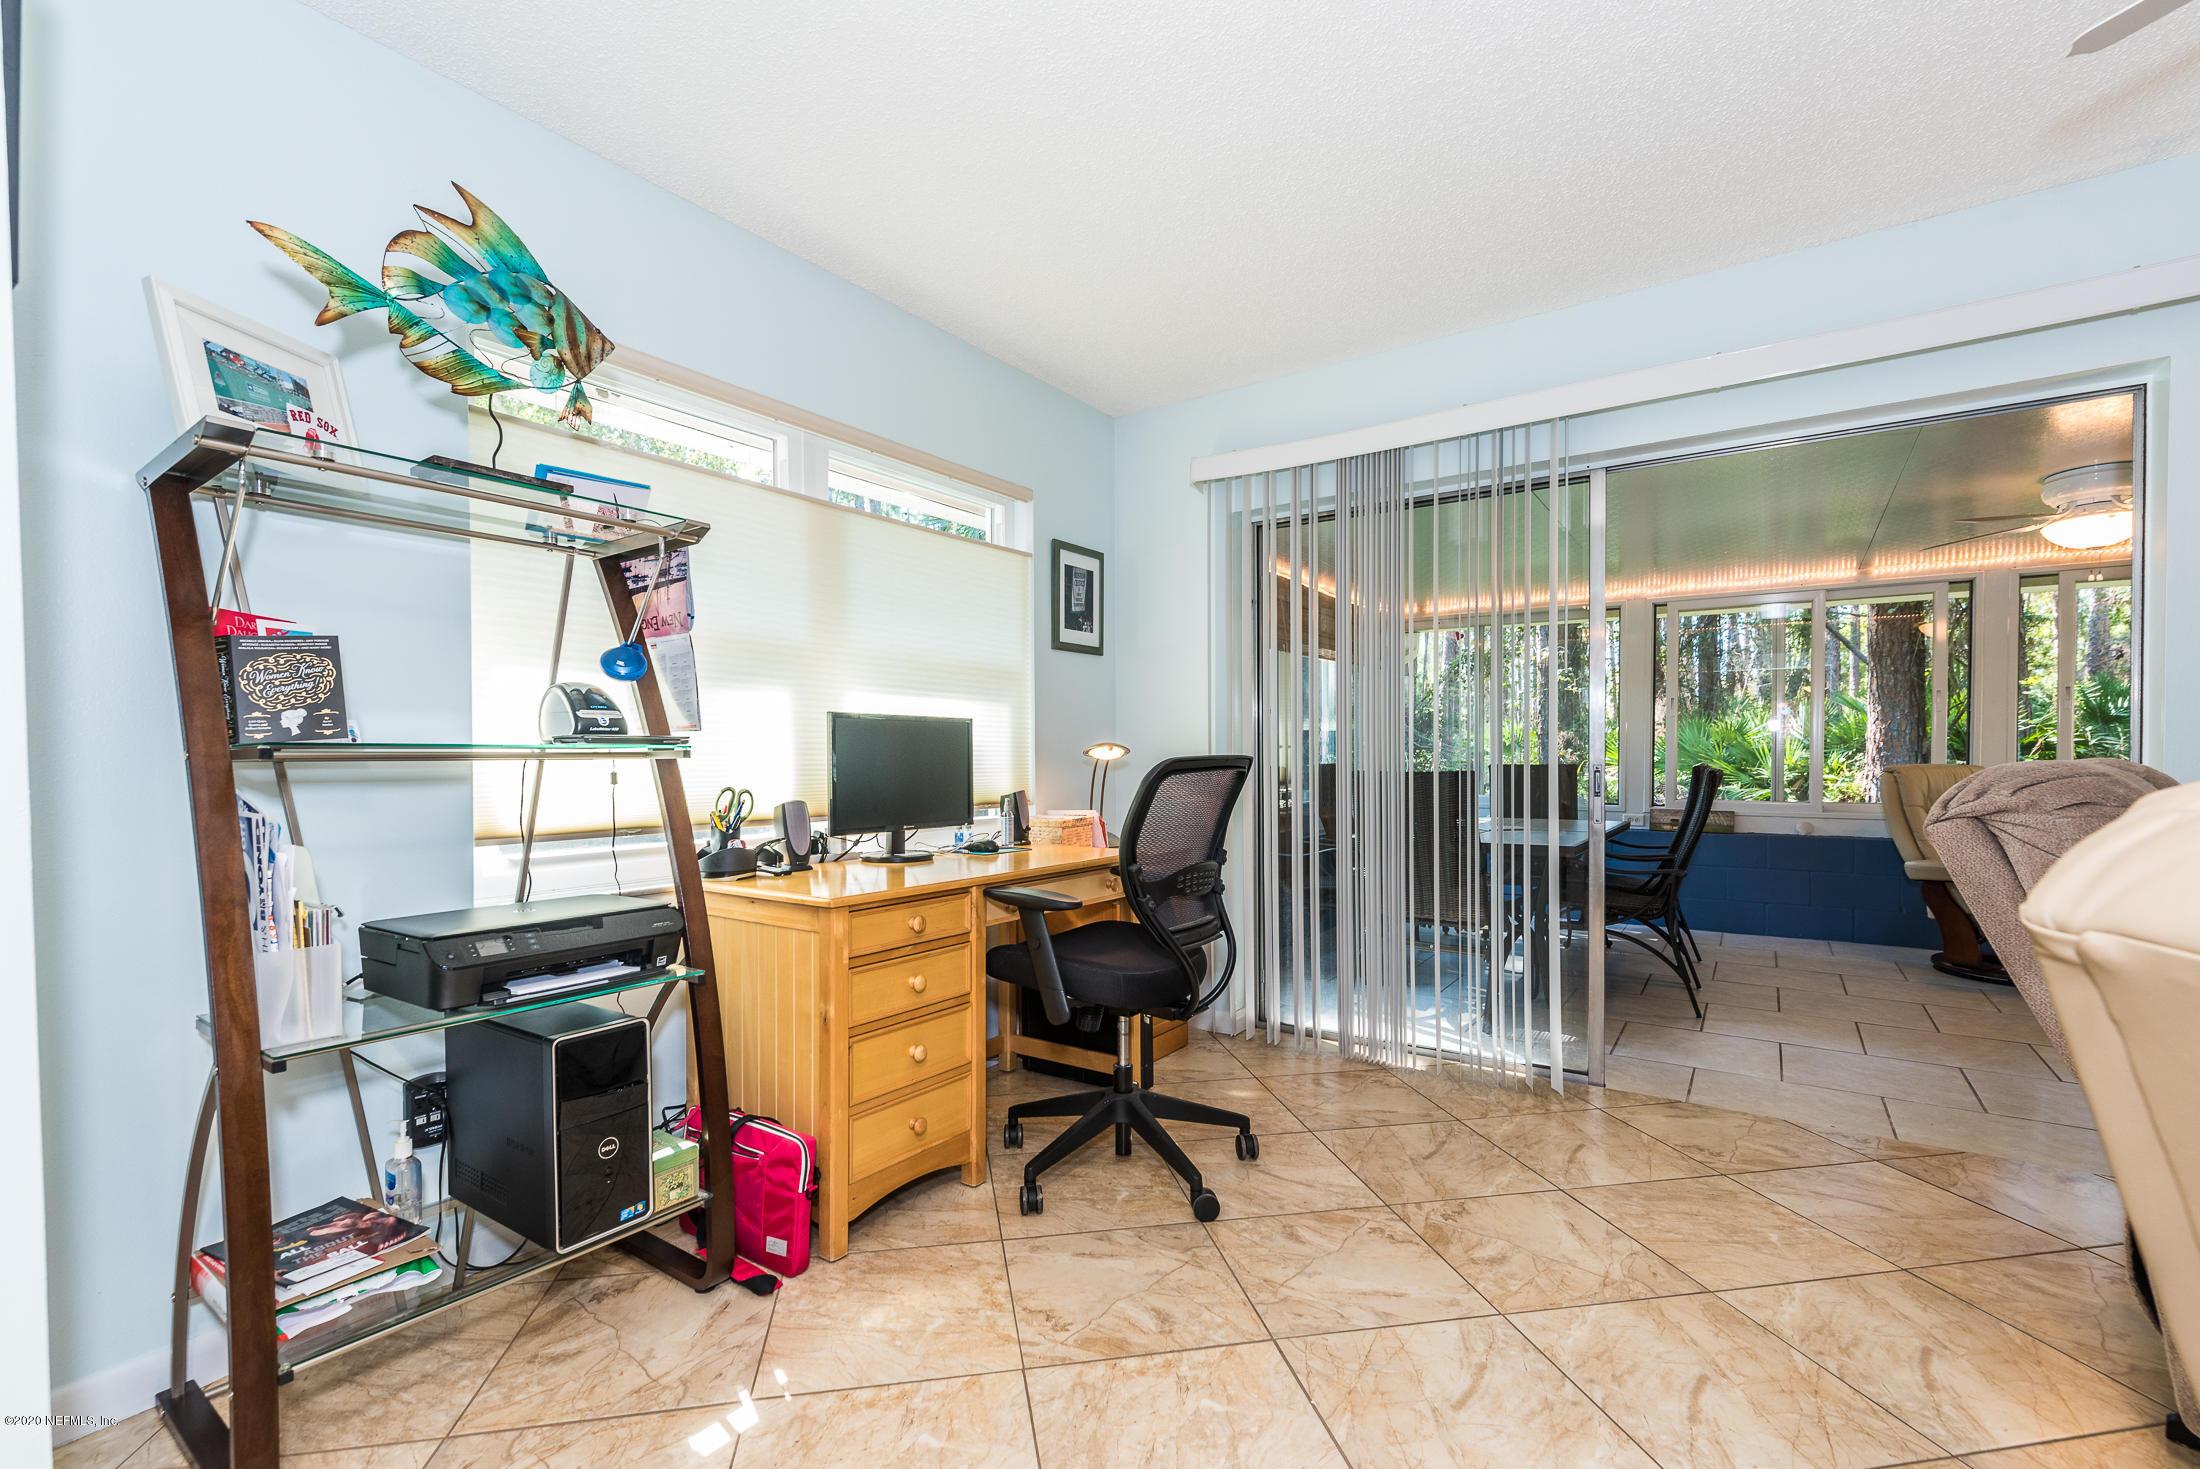 403 GRACIELA, ST AUGUSTINE, FLORIDA 32086, 2 Bedrooms Bedrooms, ,2 BathroomsBathrooms,Residential,For sale,GRACIELA,1081721